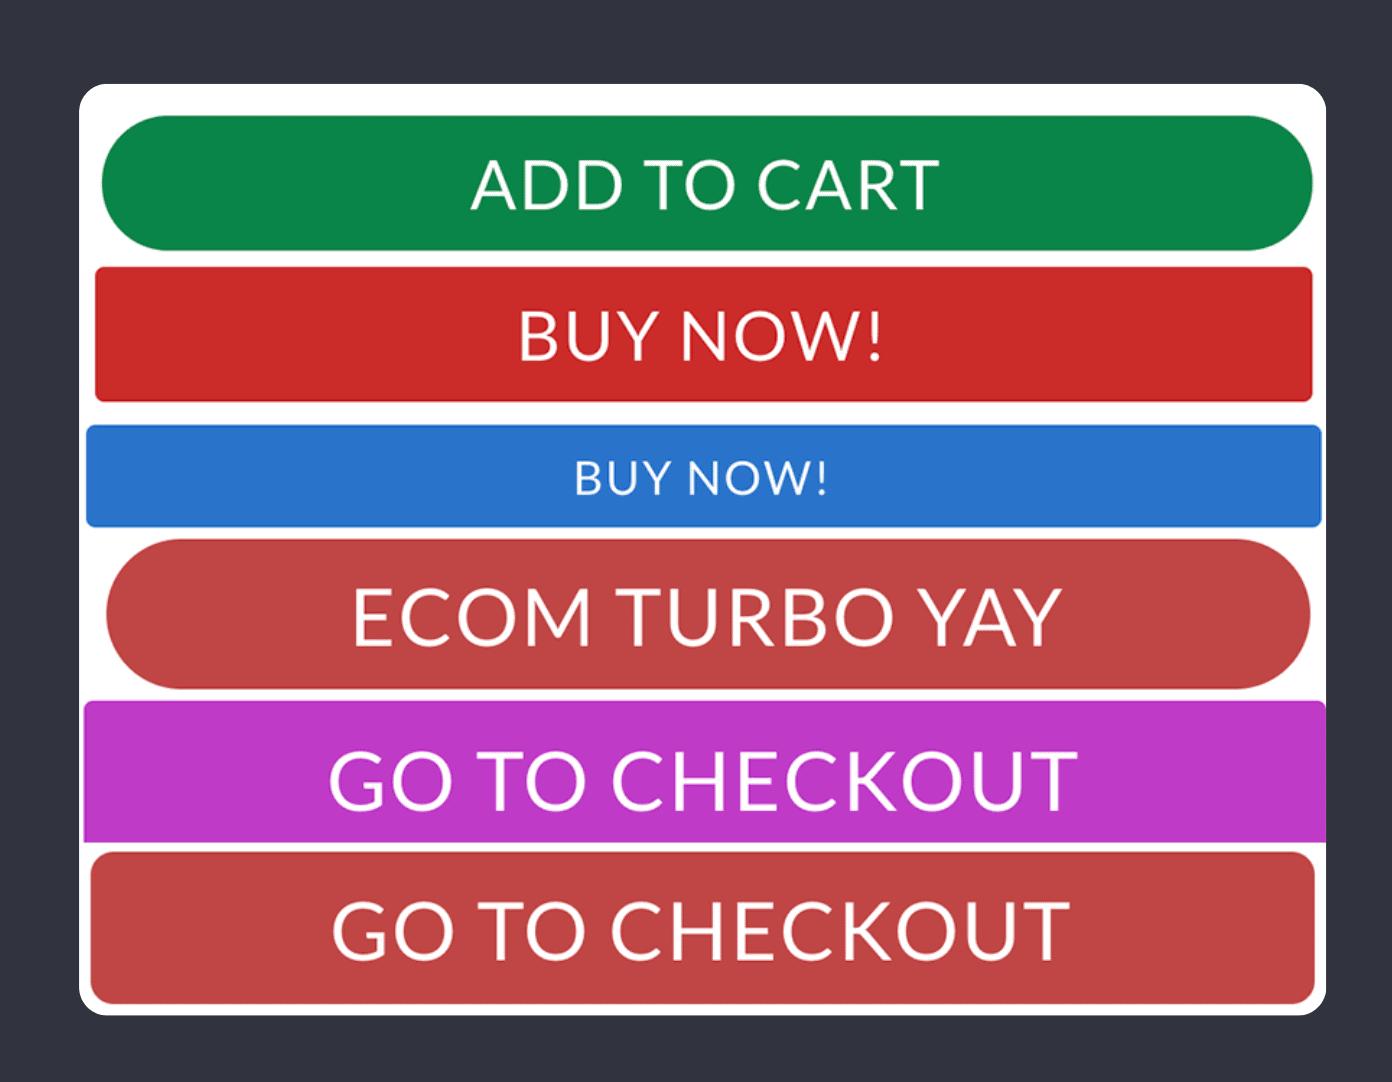 Ecomturbo sales